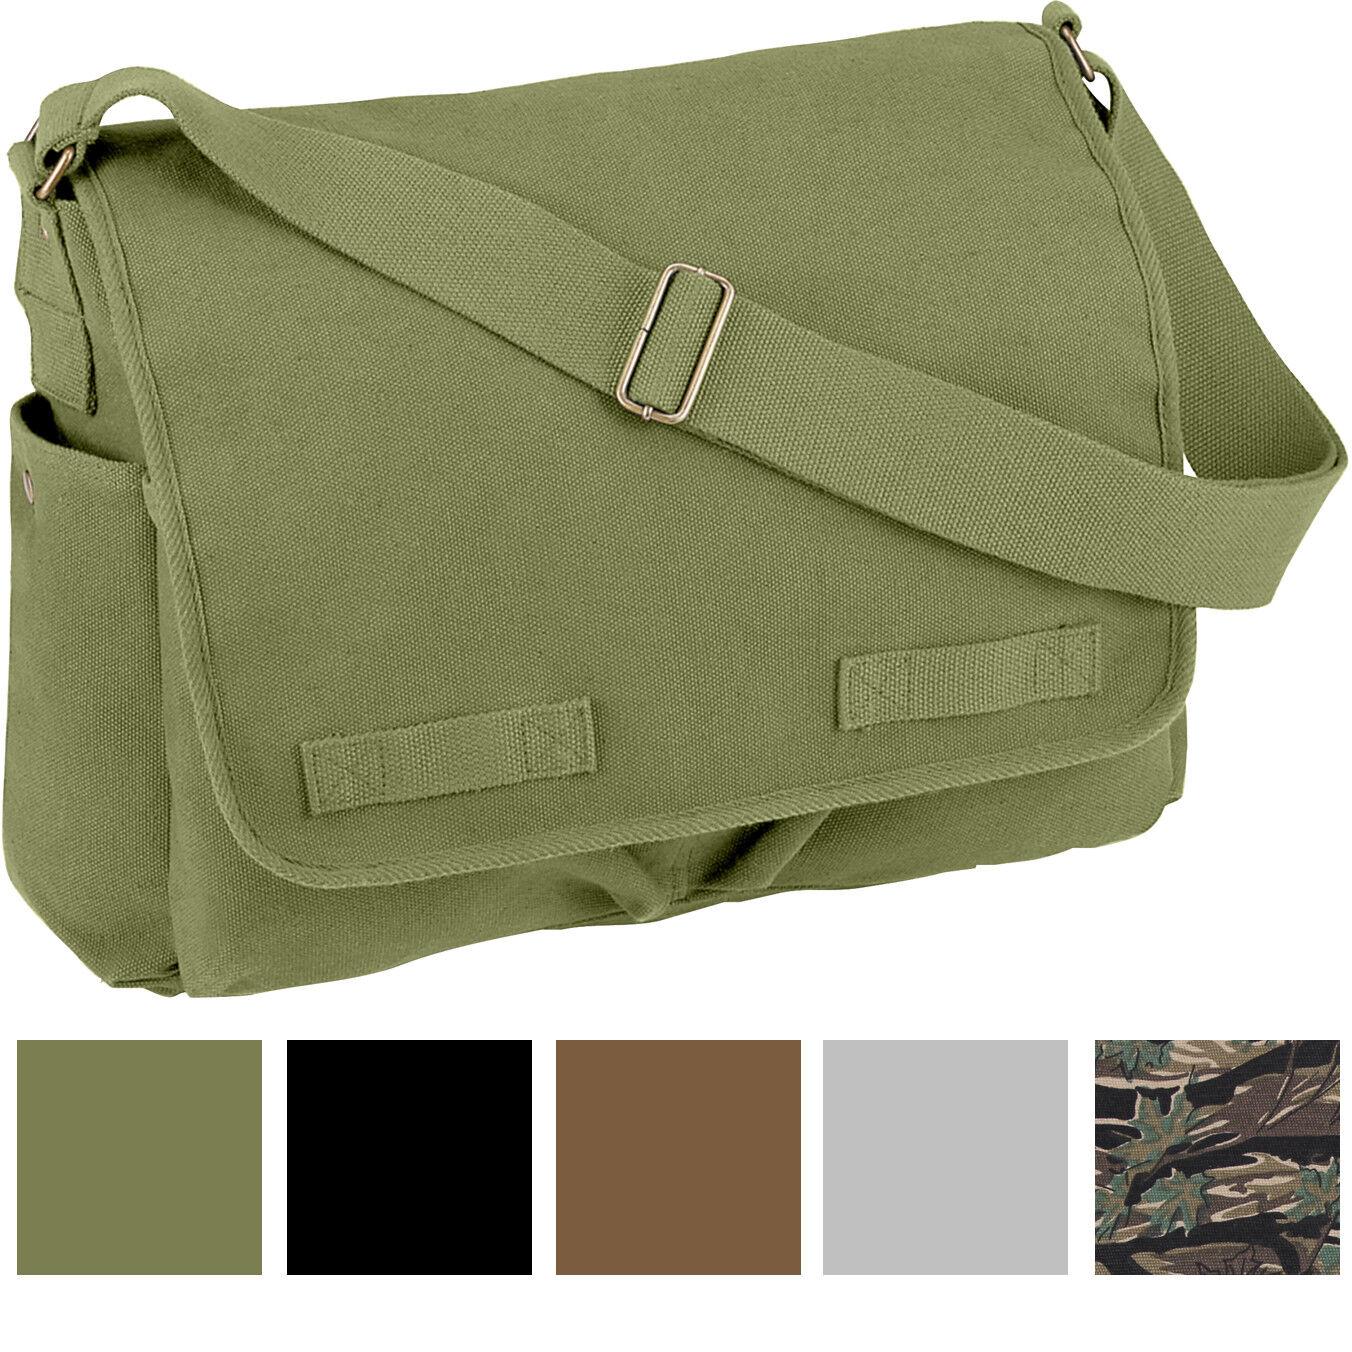 Vintage Canvas Messenger Bag Heavyweight Military Shoulder School Satchel Sling Bags